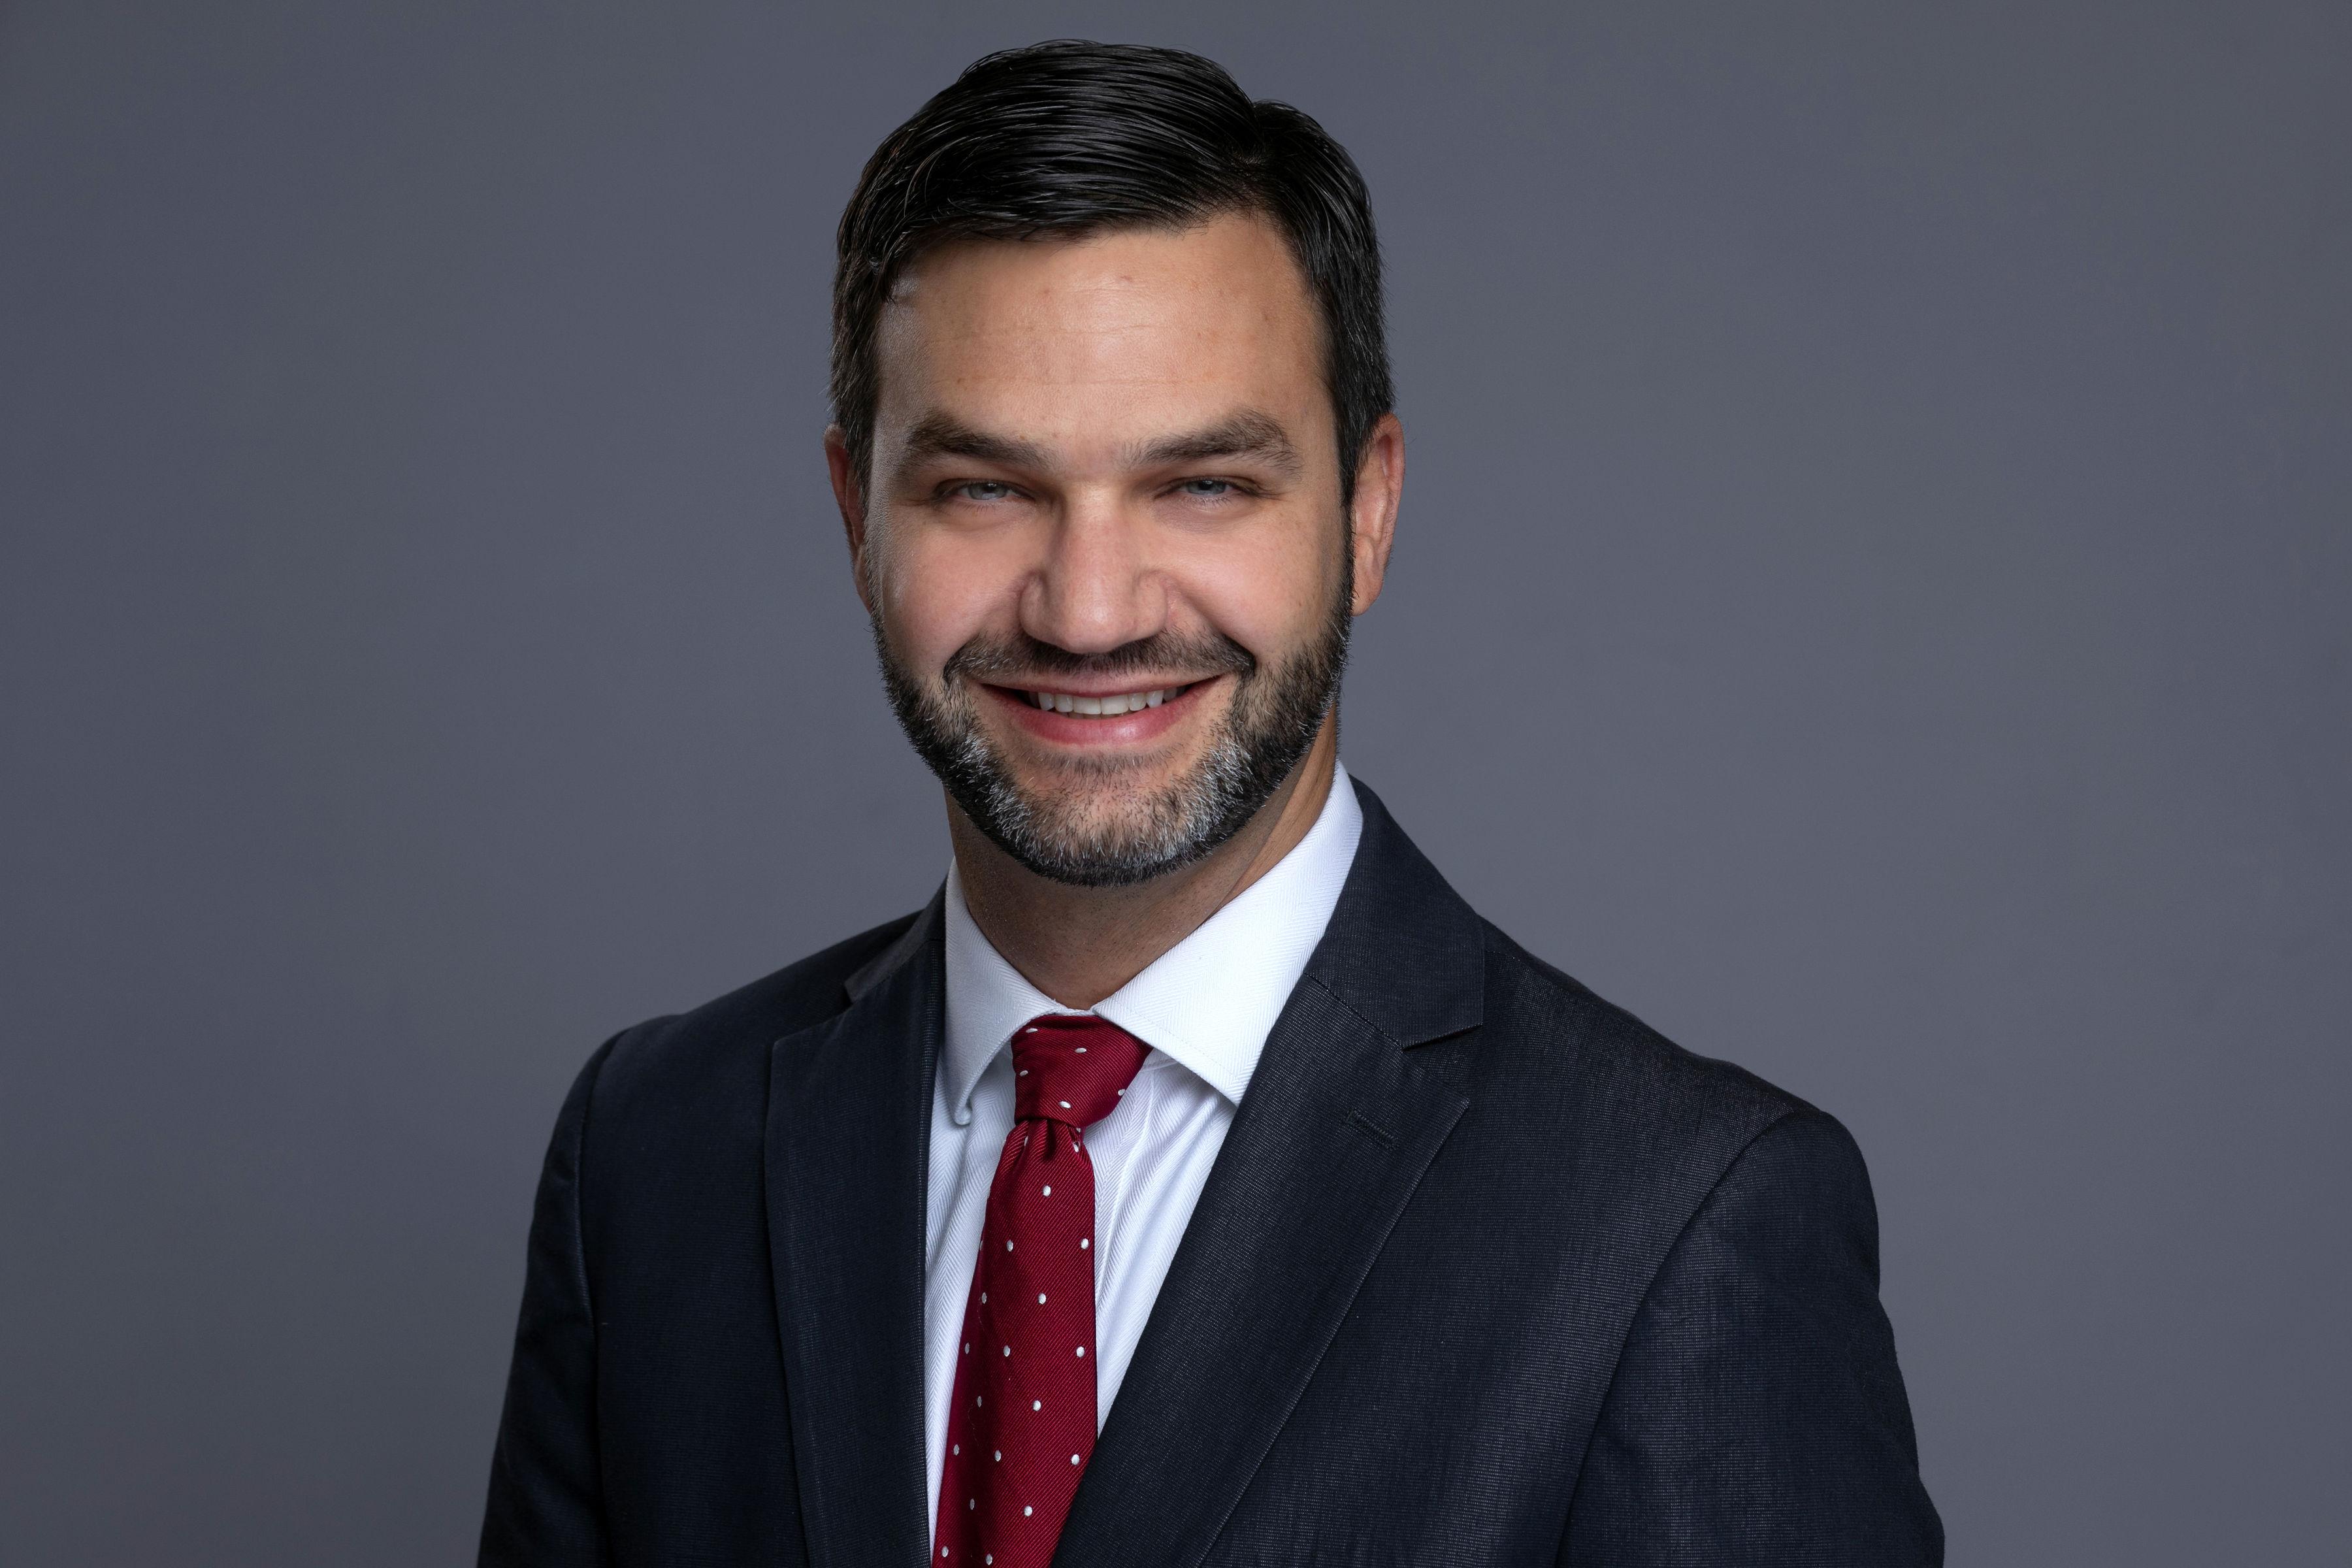 headshot of Daniel Bauer